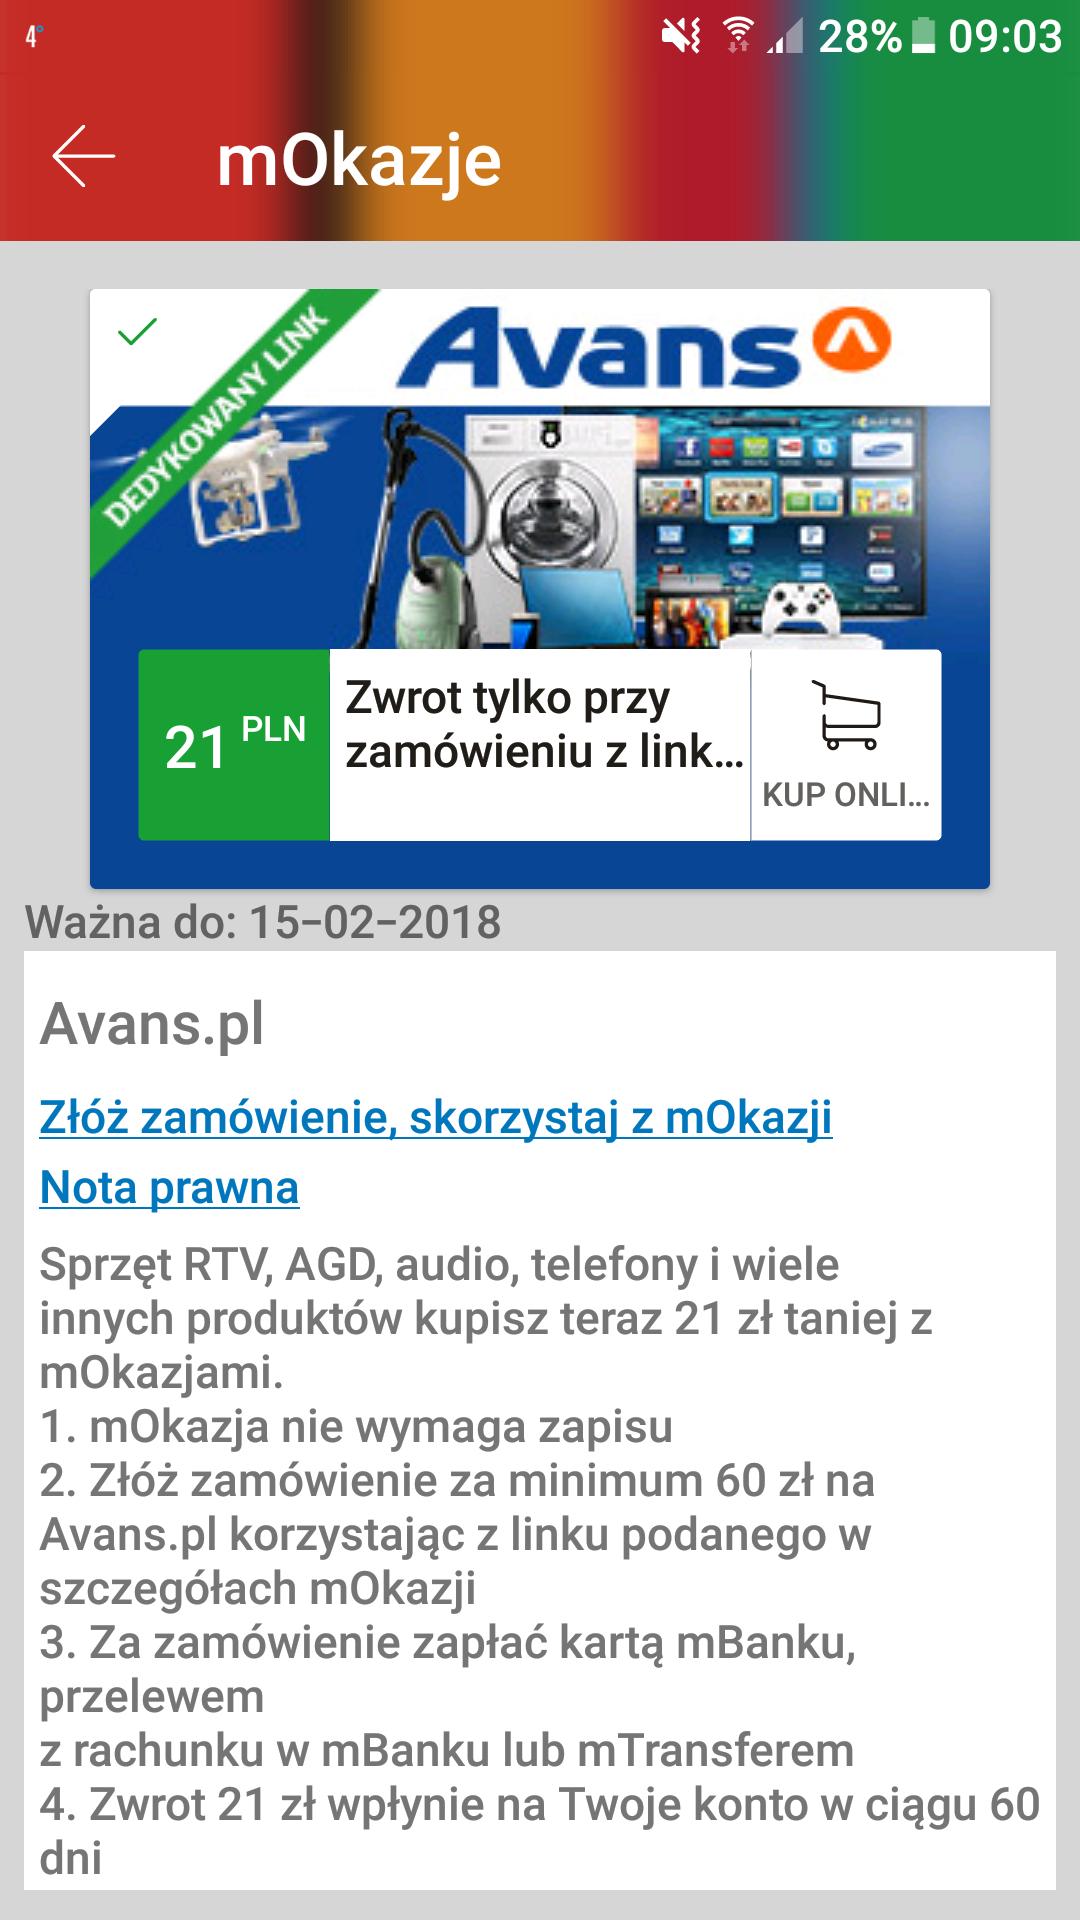 Zwrot 21zł za zakup w Avans.pl @mOkazja mBank